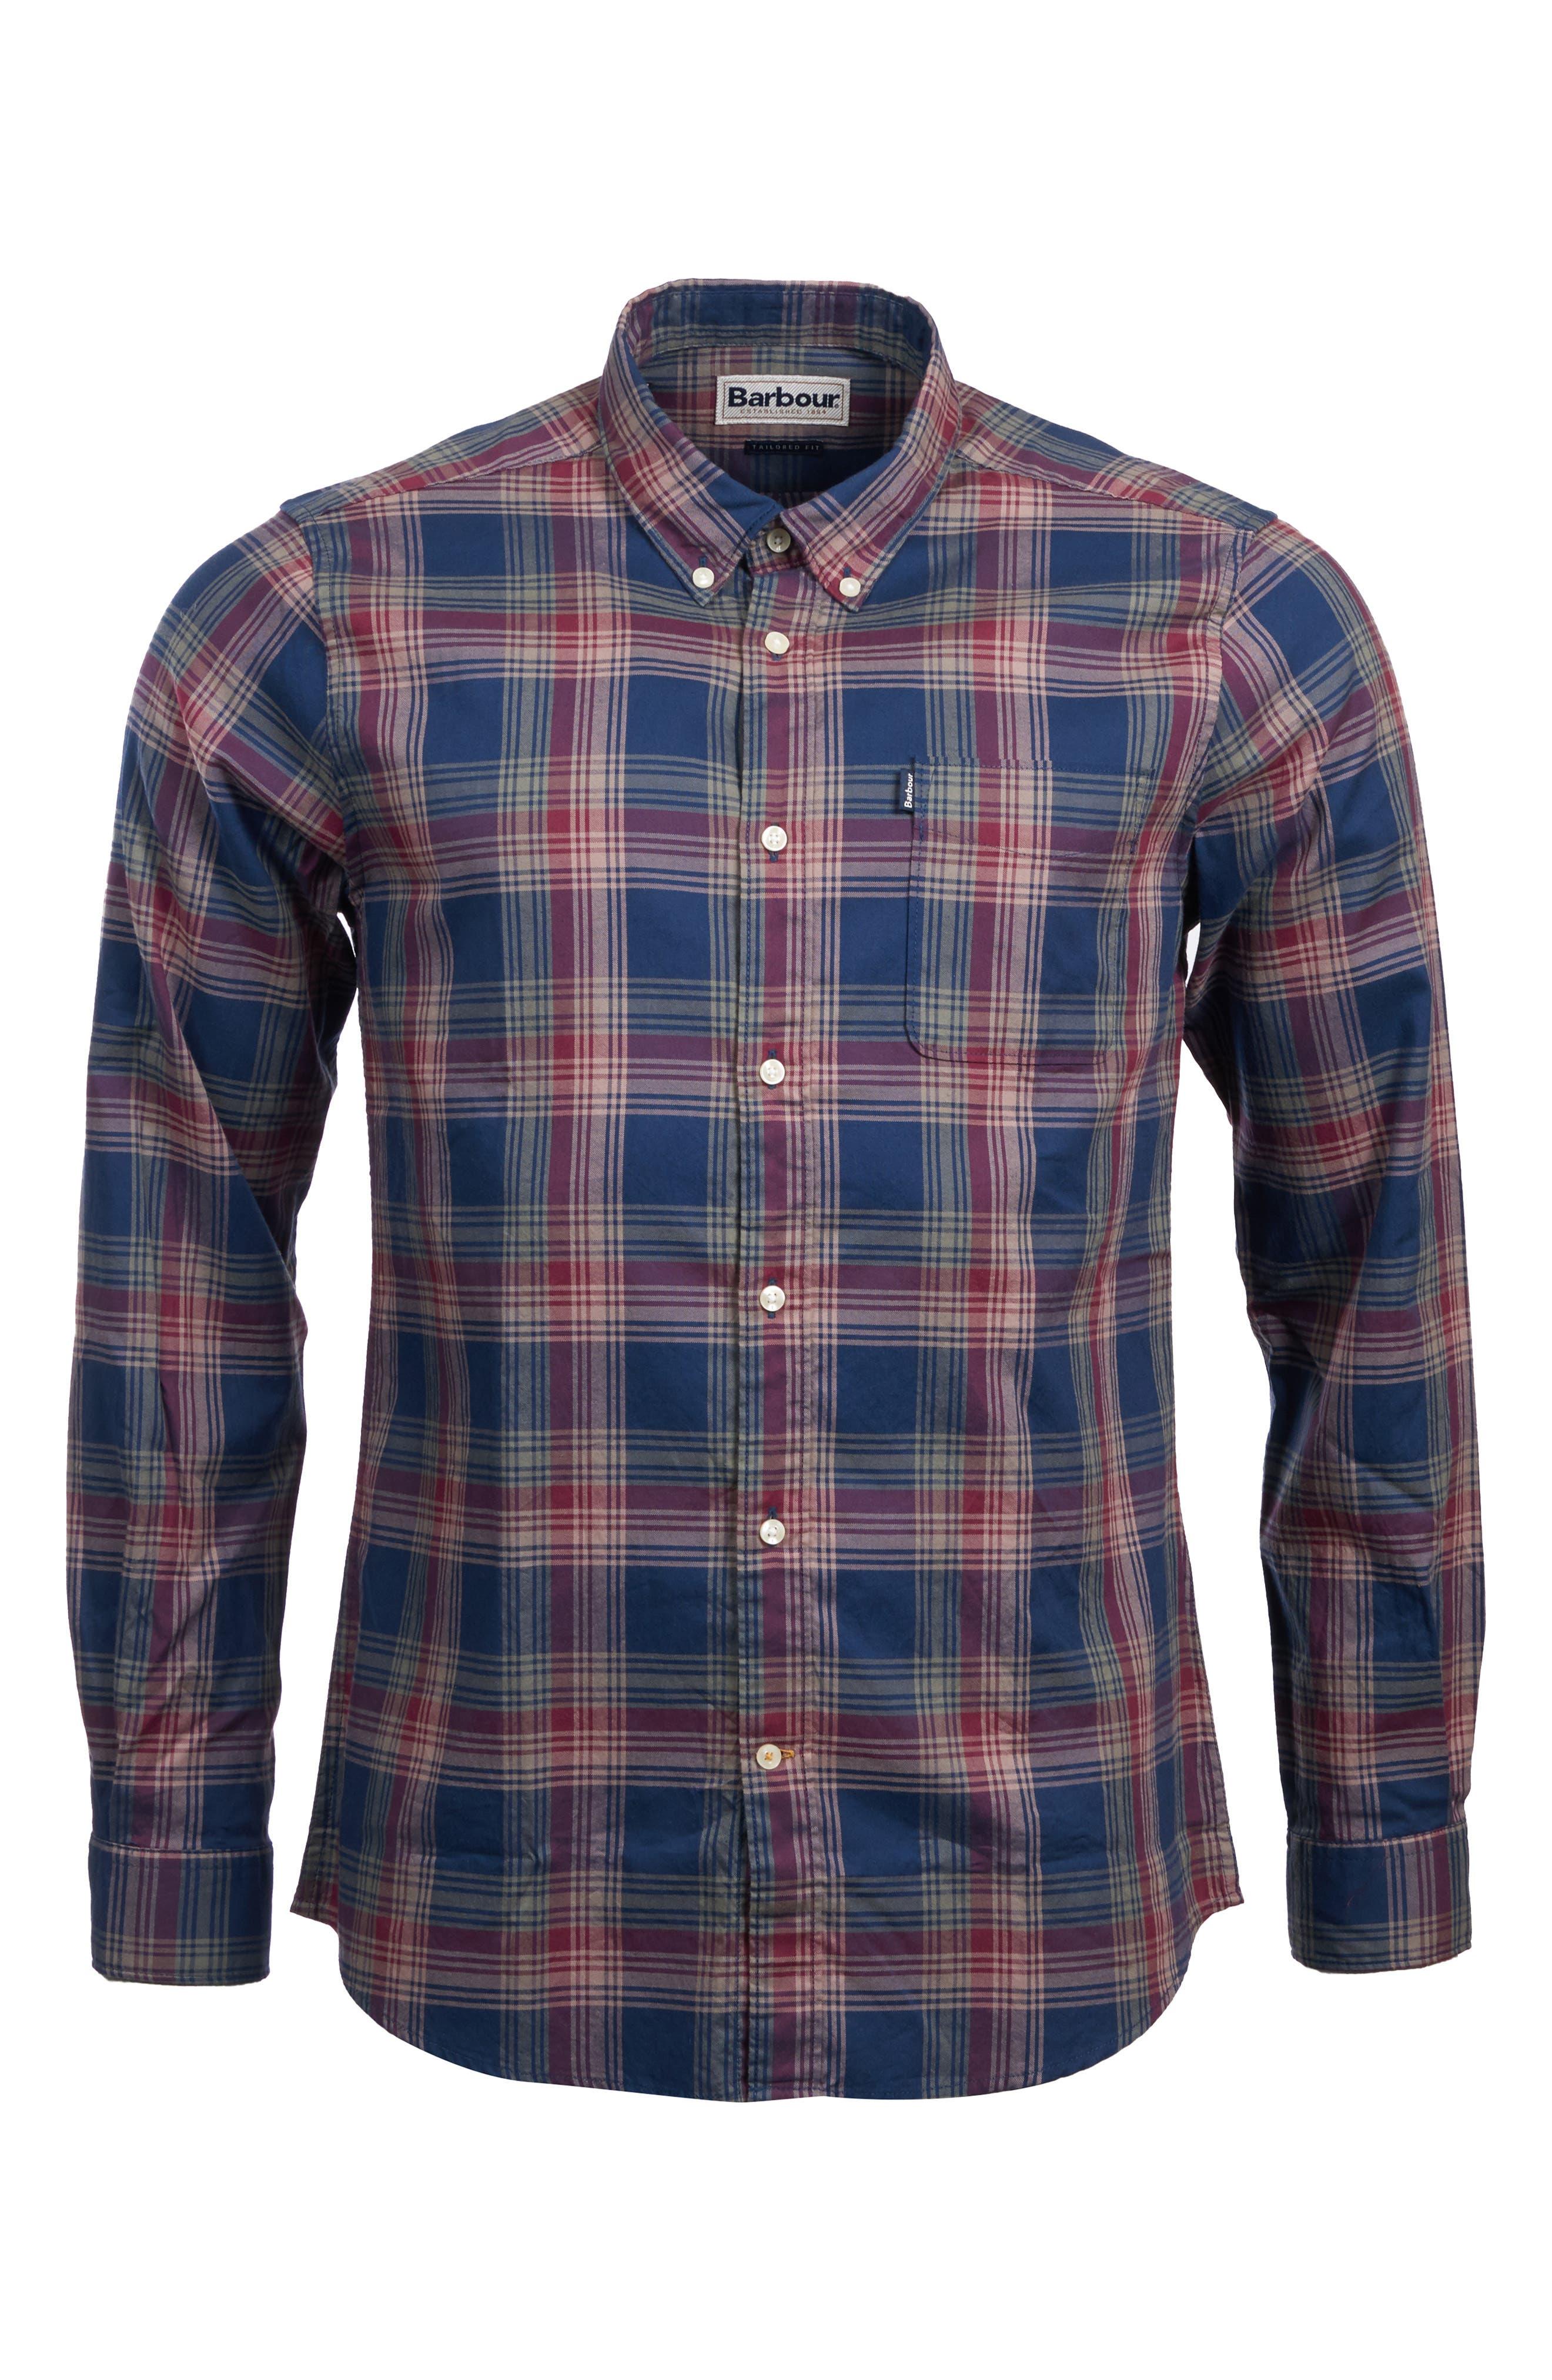 Endsleigh Highland Check Woven Shirt,                             Alternate thumbnail 5, color,                             NAVY